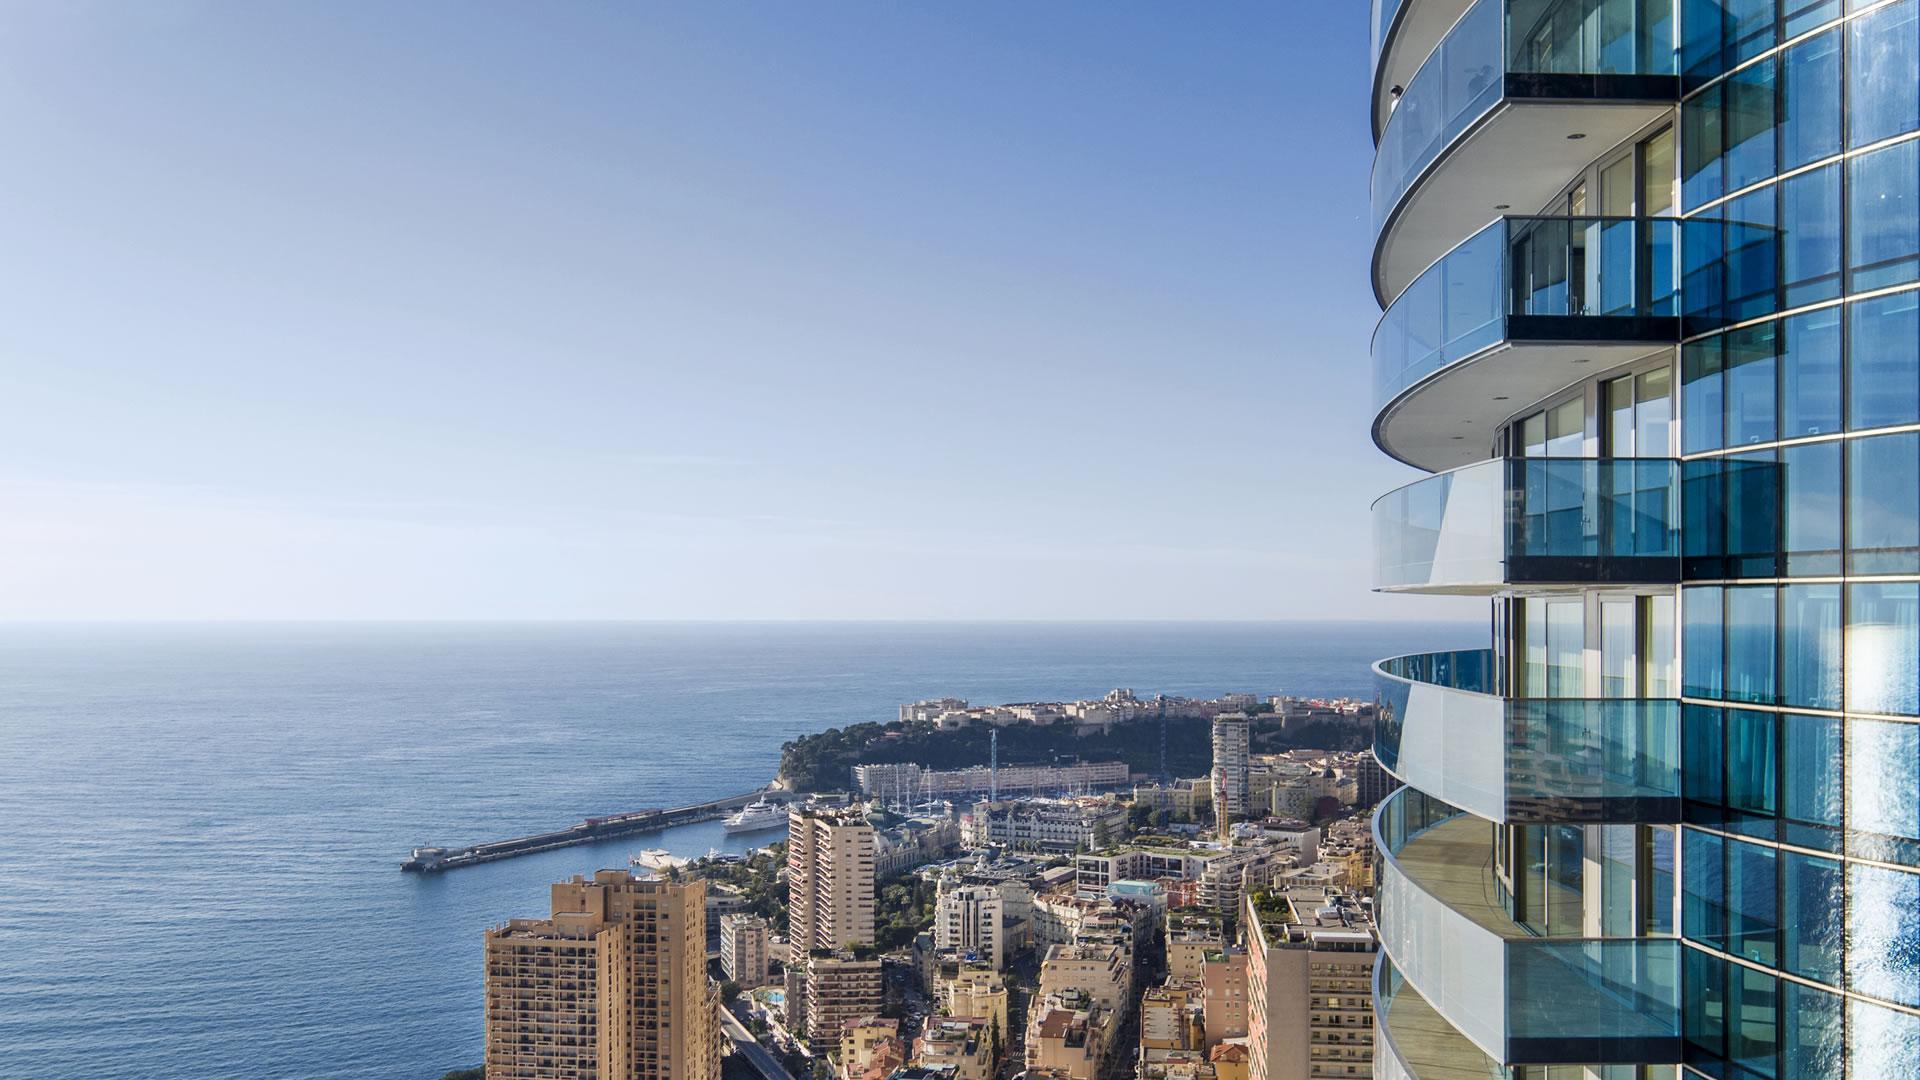 Tour Od 233 On Monaco Most Beautiful Spots